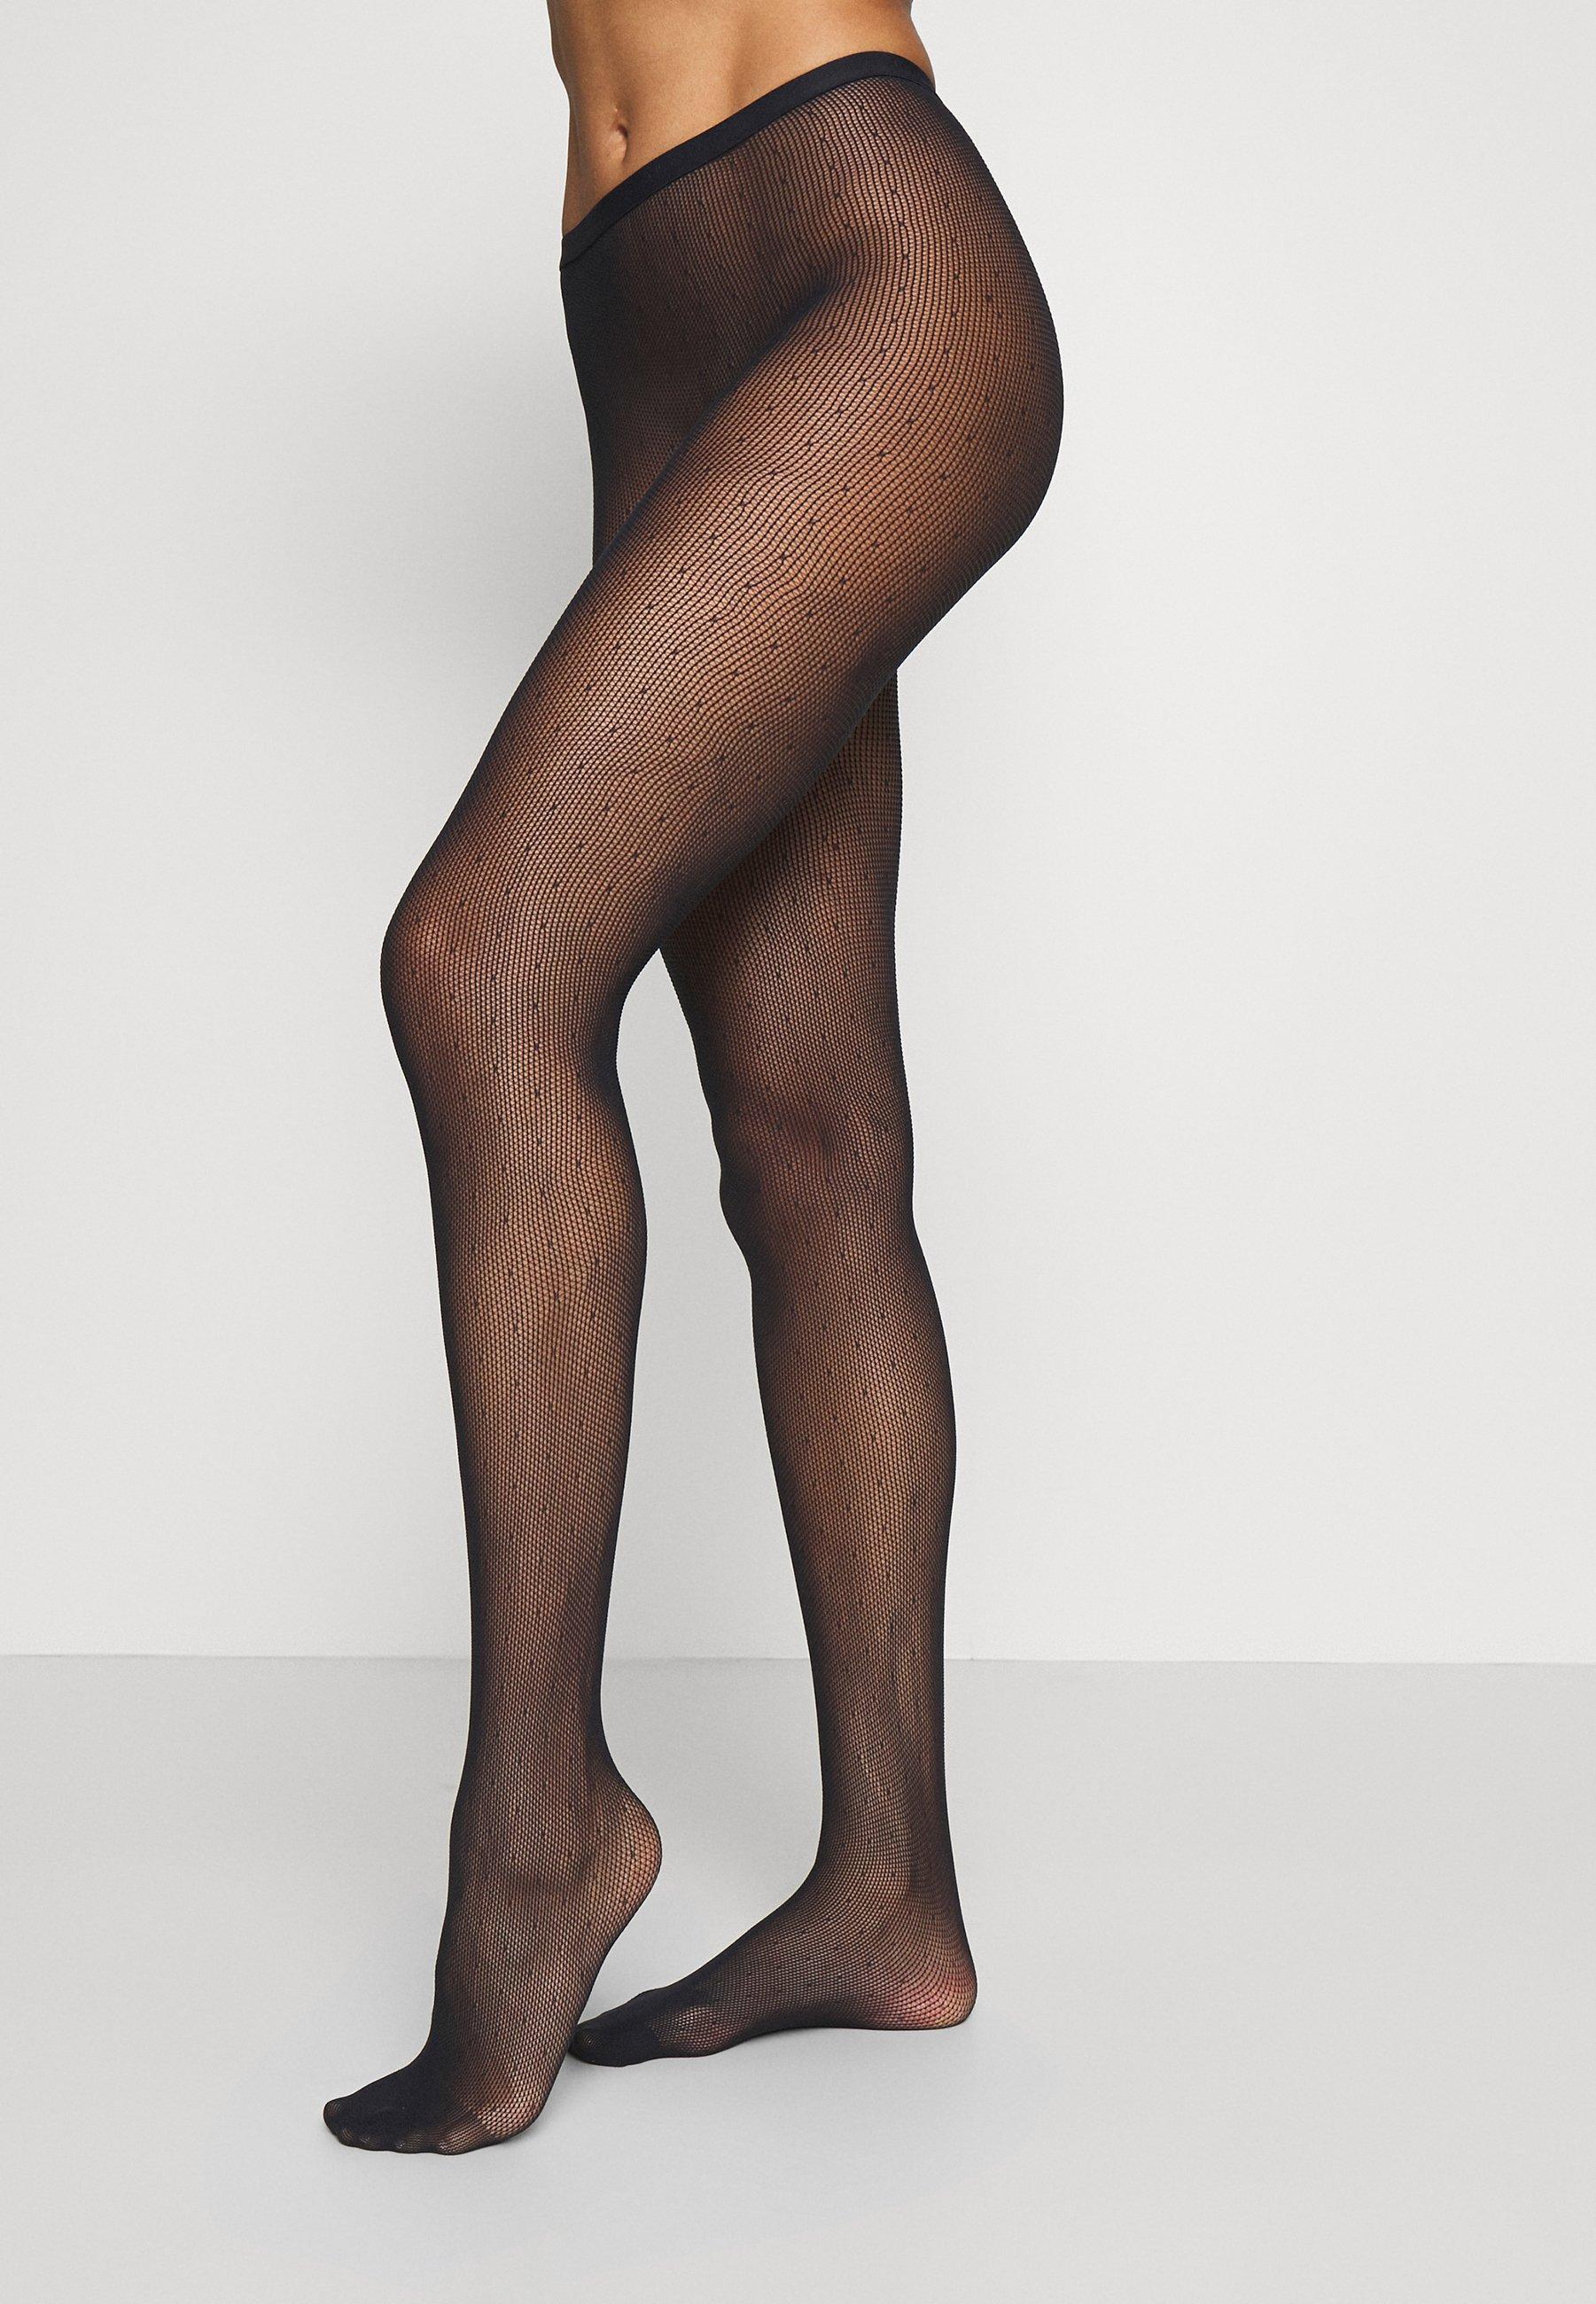 Femme FALKE PLUMETIS STRUMPFHOSE FEIN SCHWARZ - Collants